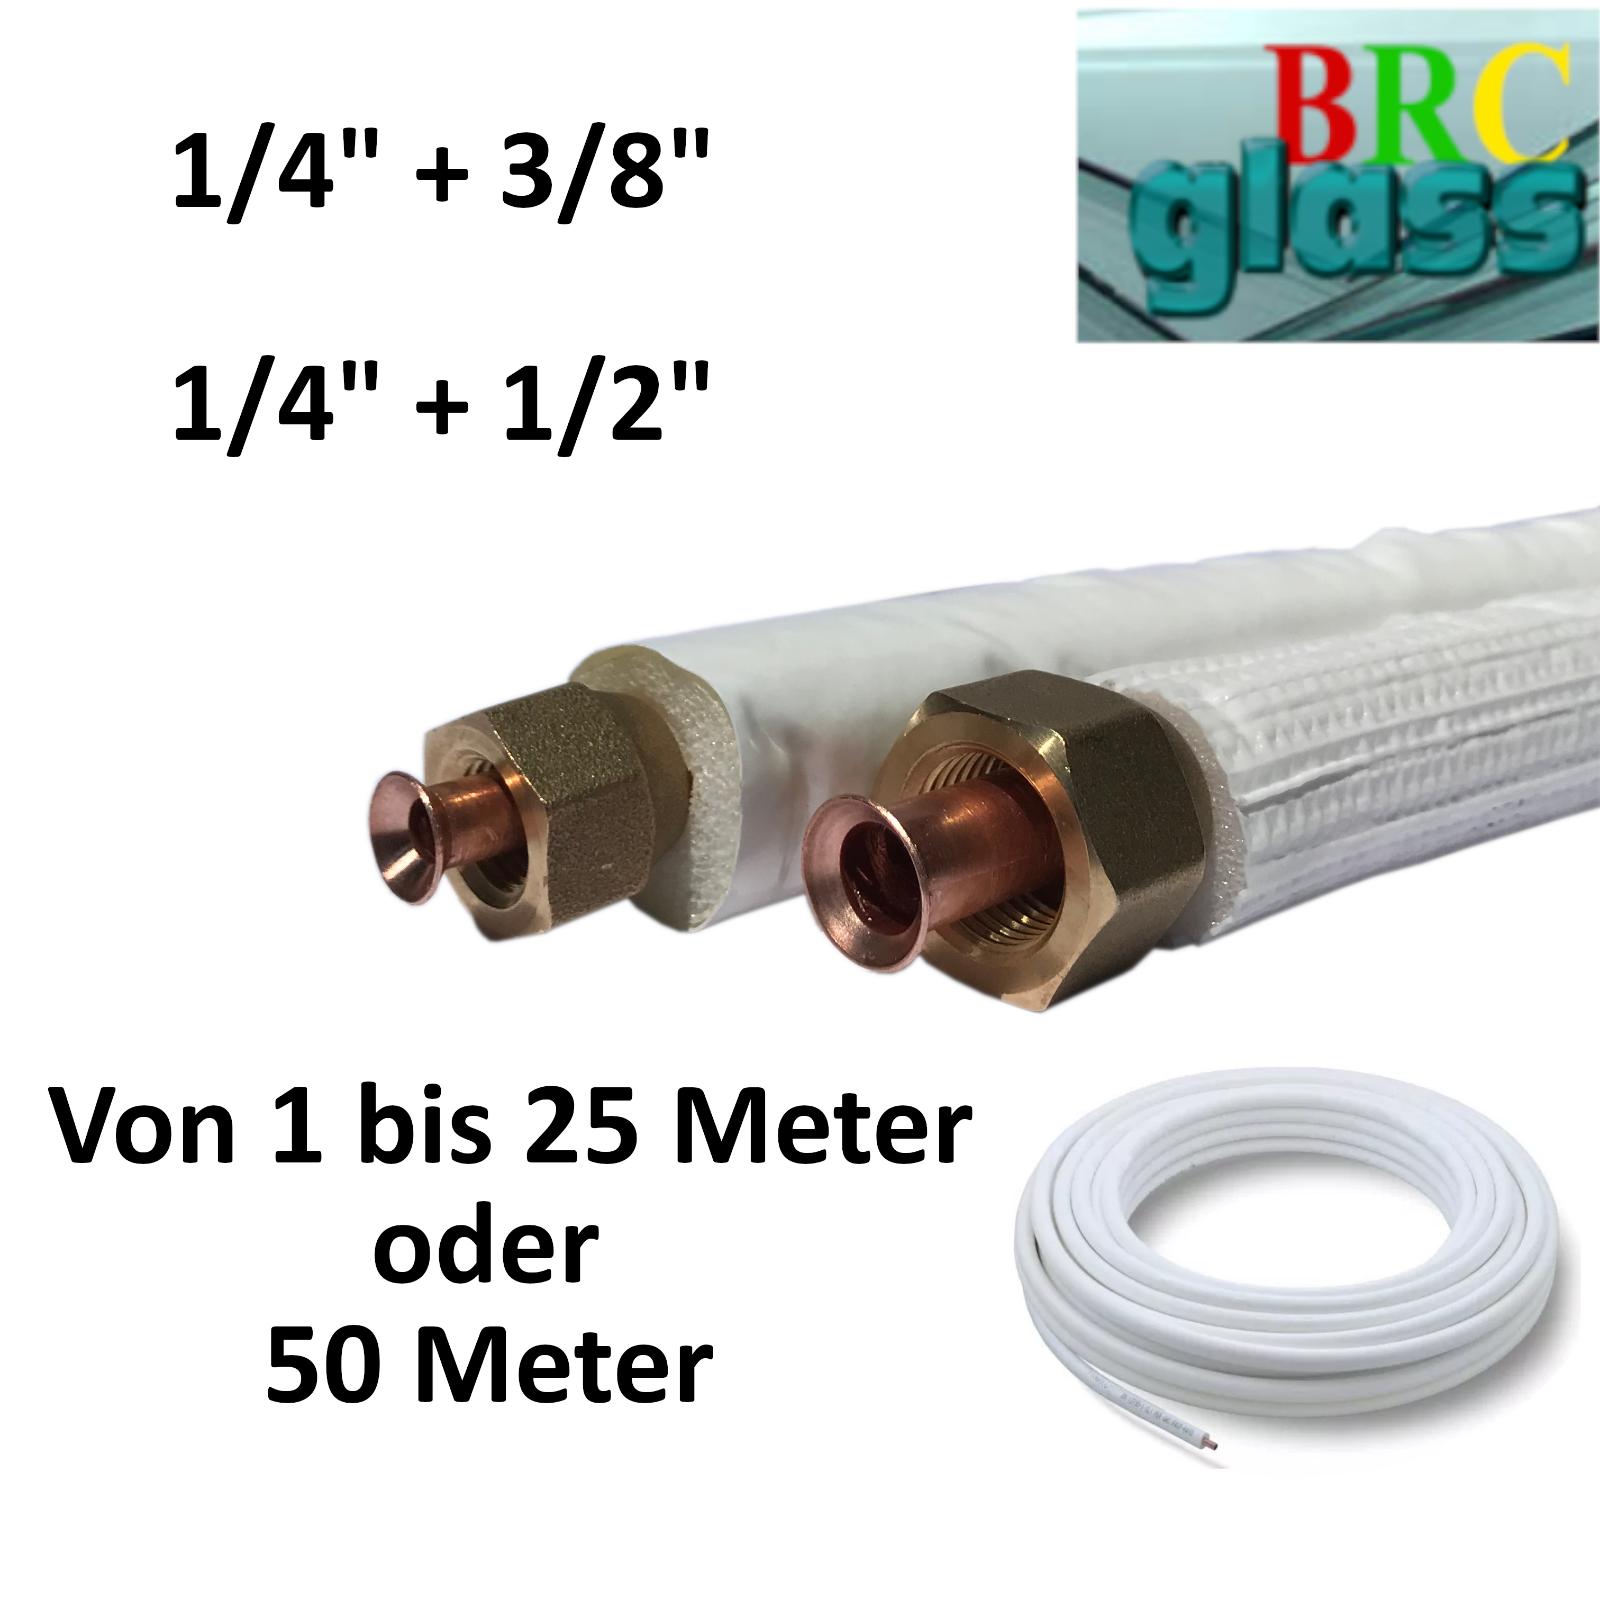 3m Kupferleitung 1//4 1//2 Zoll doppel K/ältemittelleitung geb/ördelt